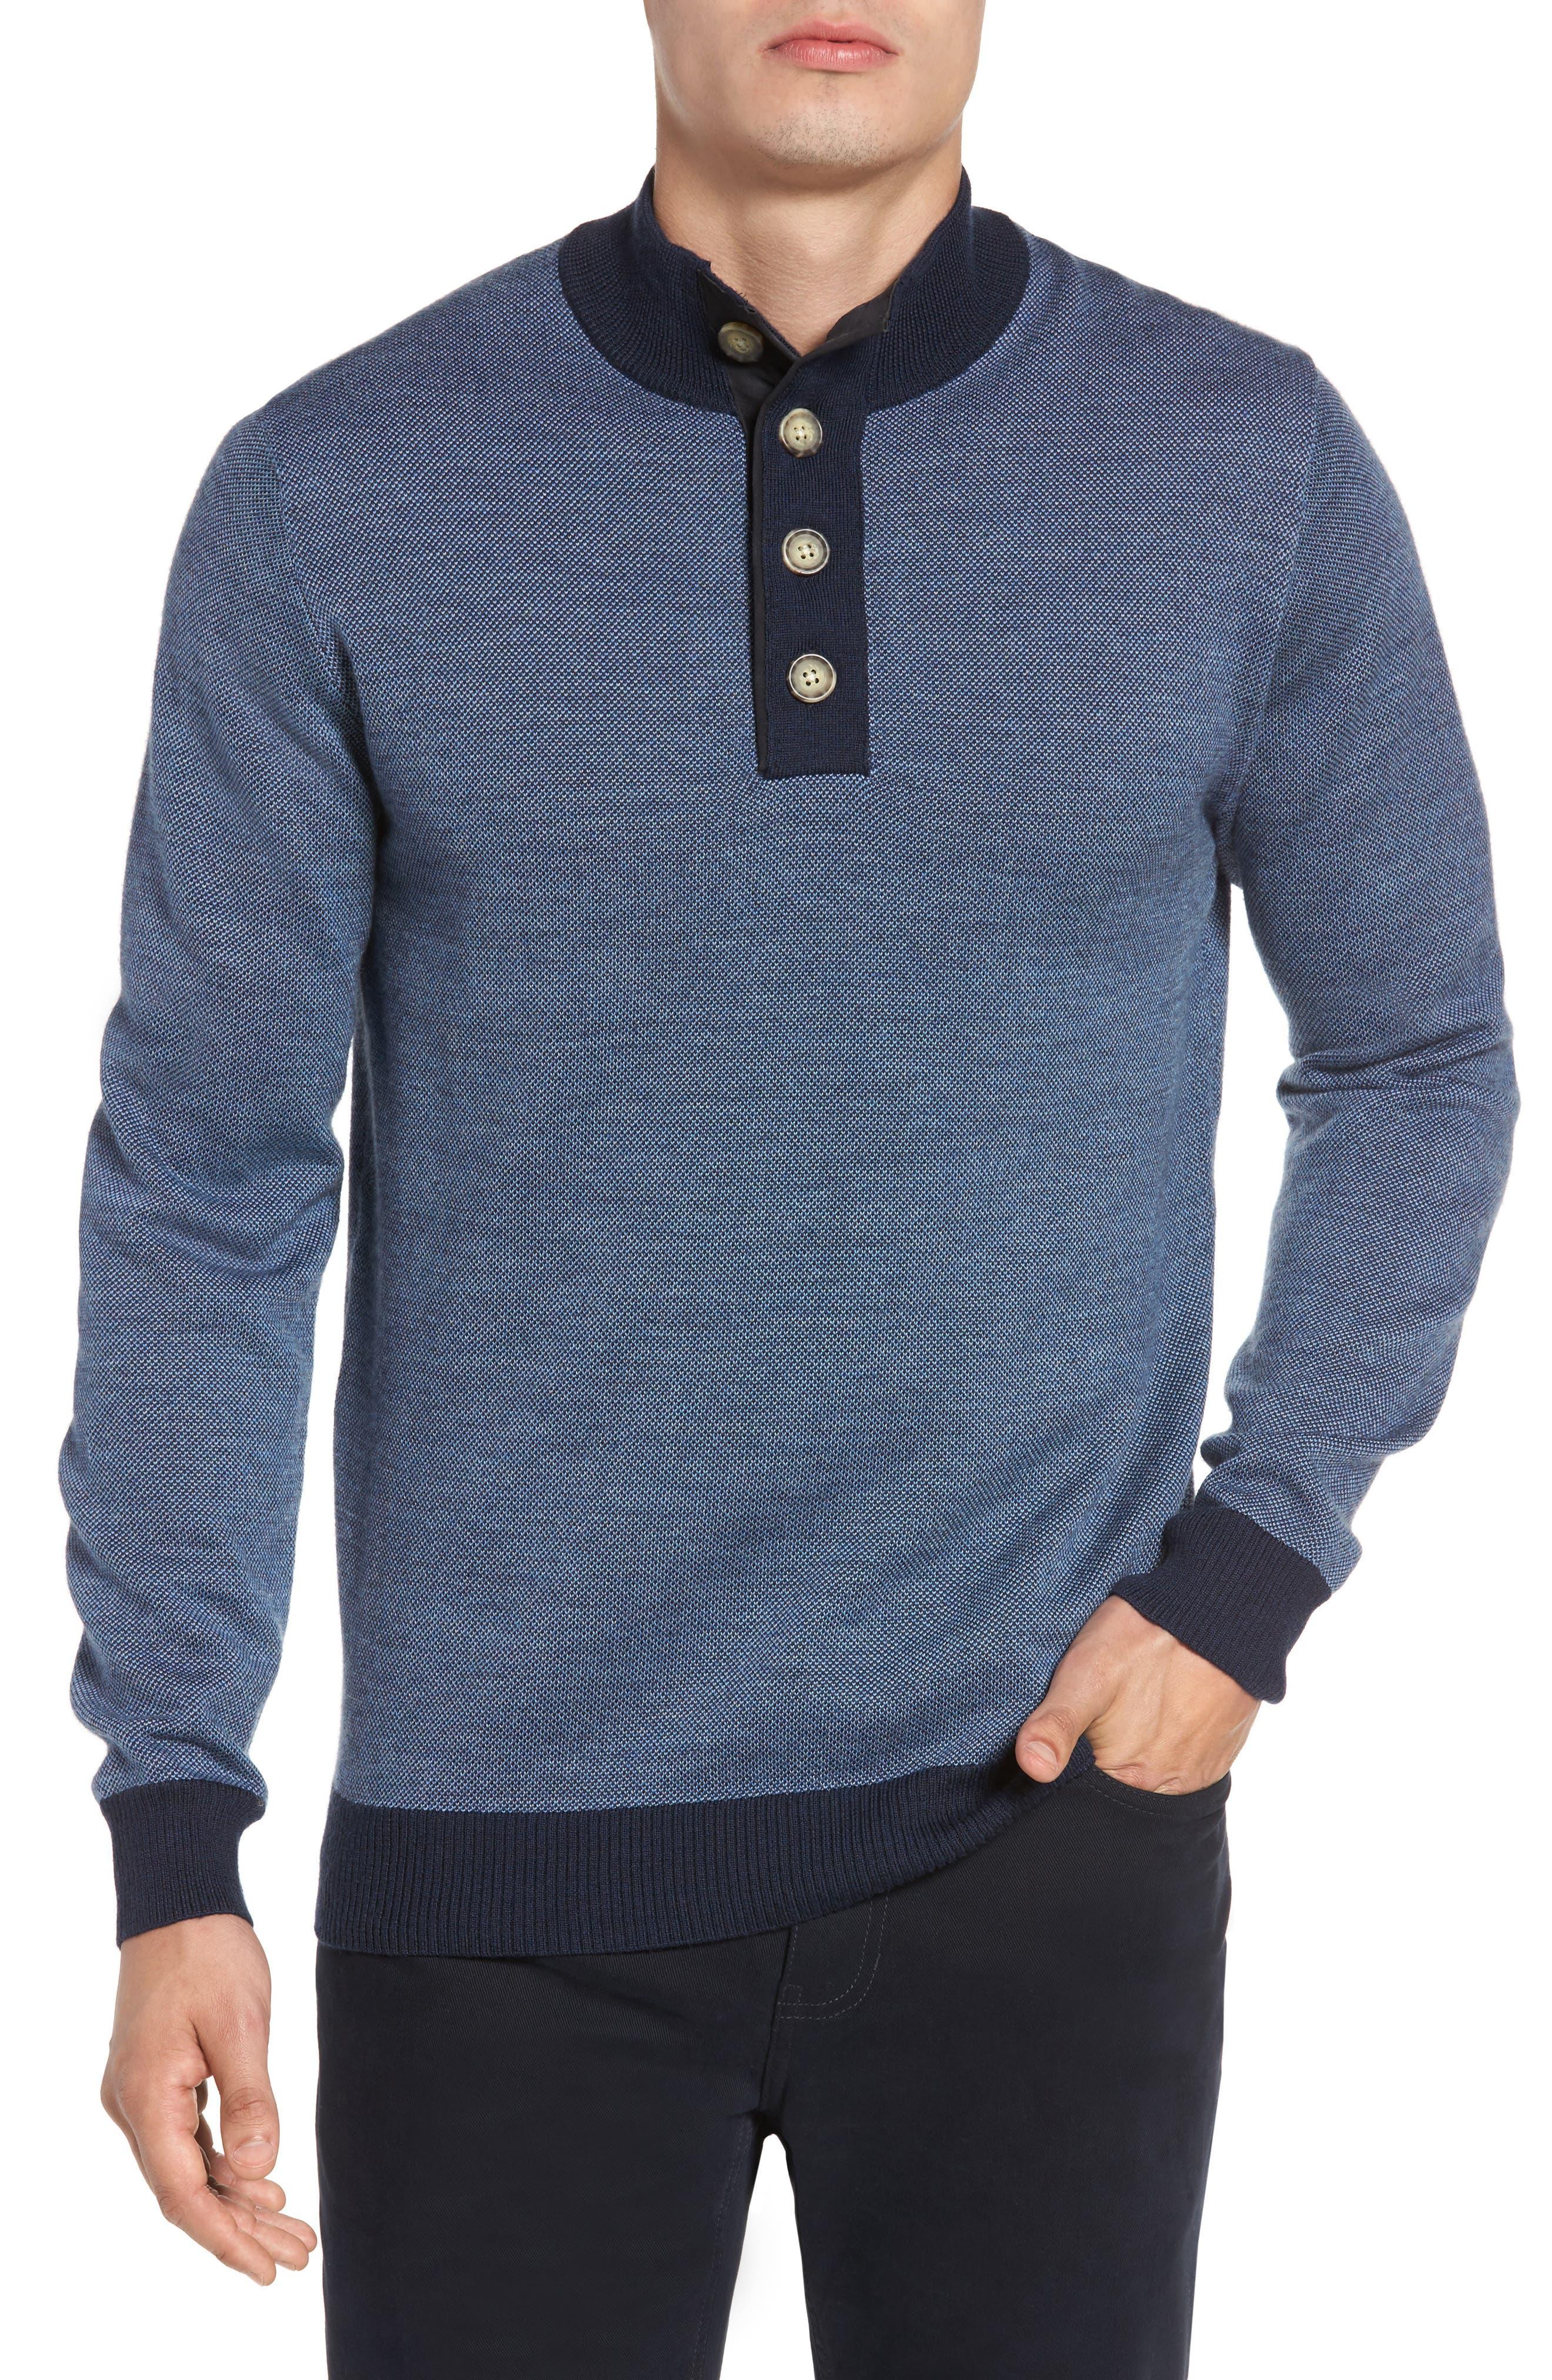 Rodd & Gunn Constellation Drive Wool Sweater